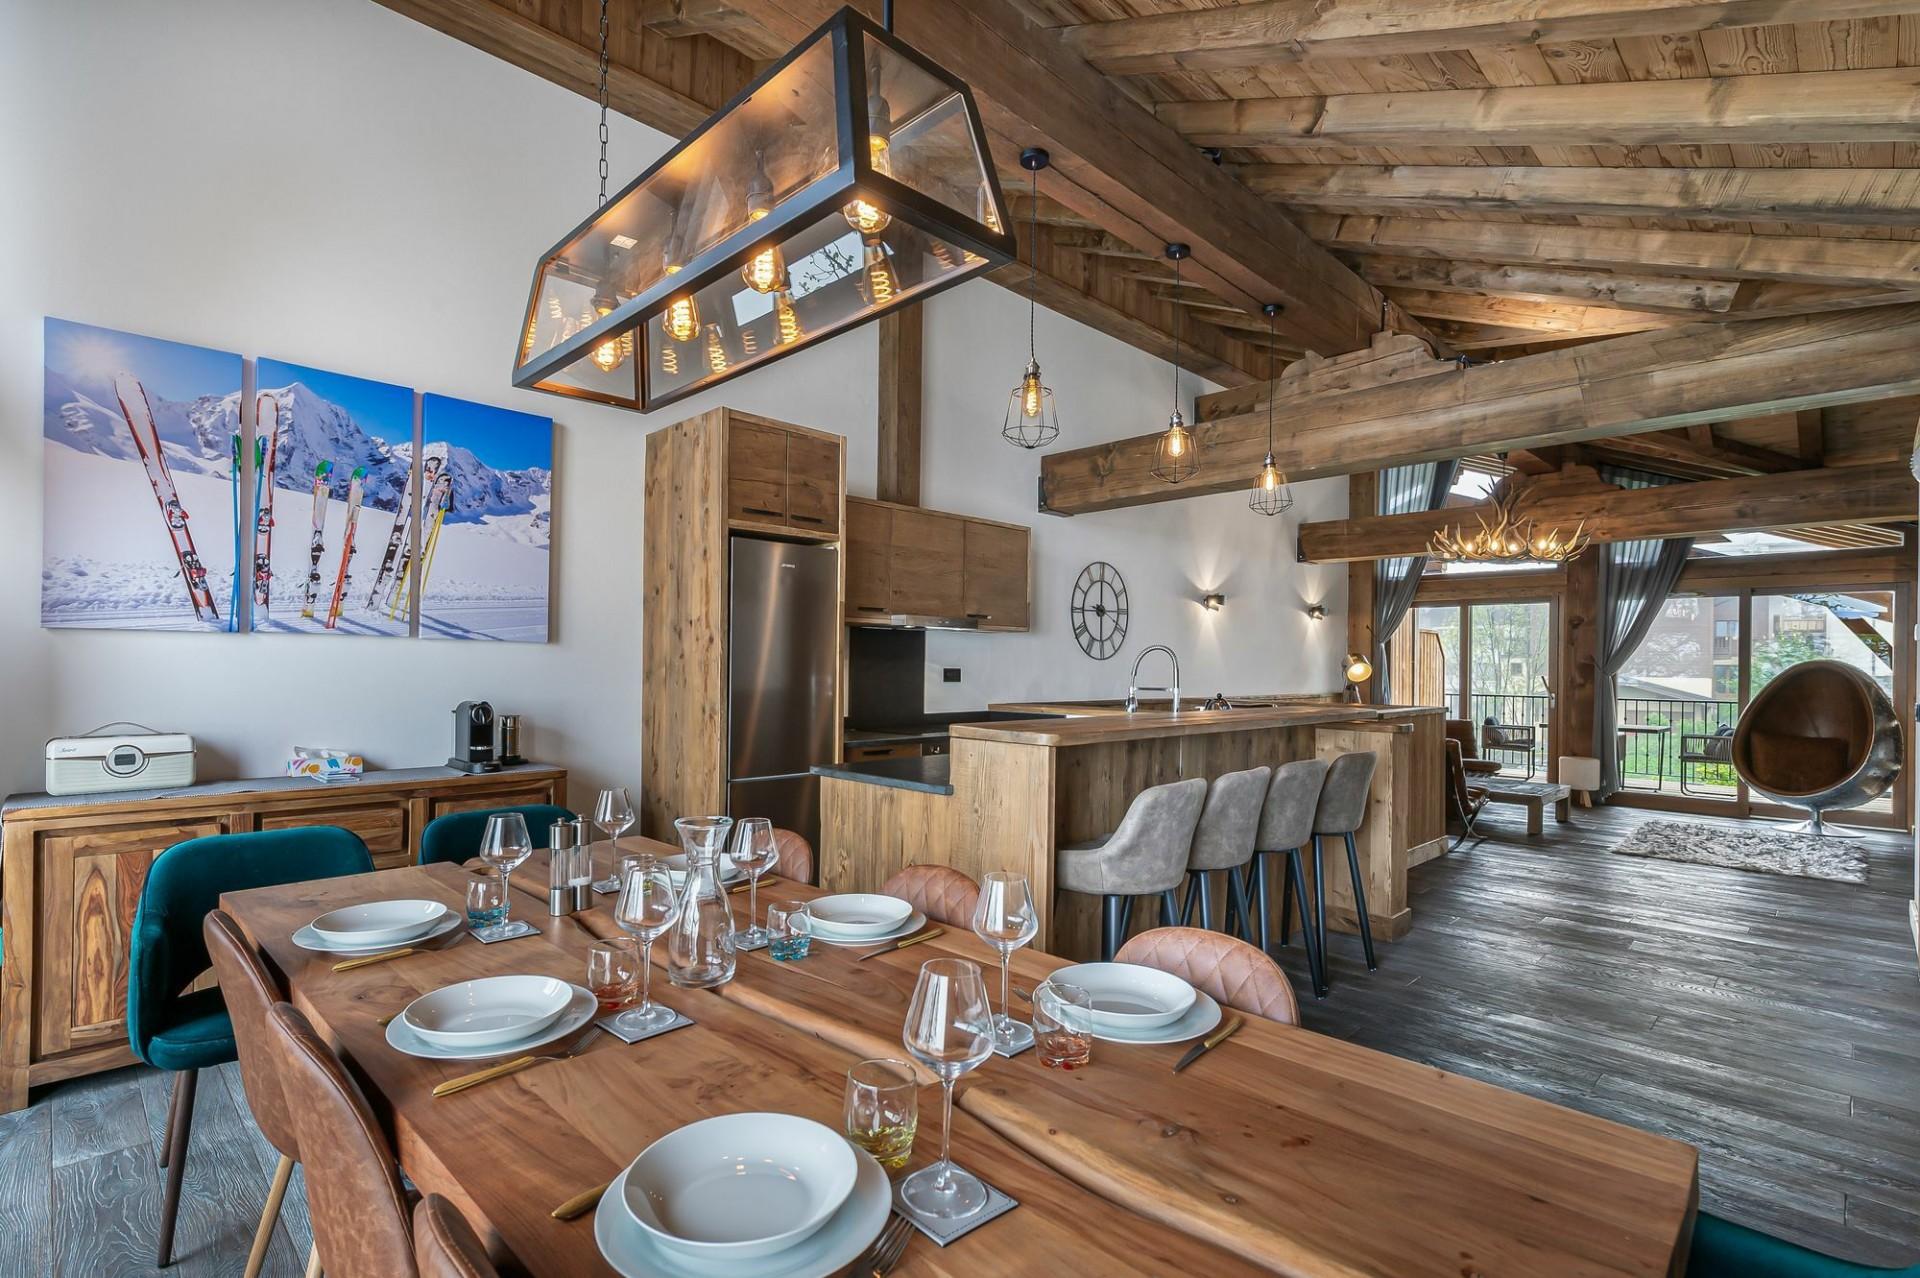 Courchevel 1300 Location Appartement Luxe Tilante Salle A Manger 2